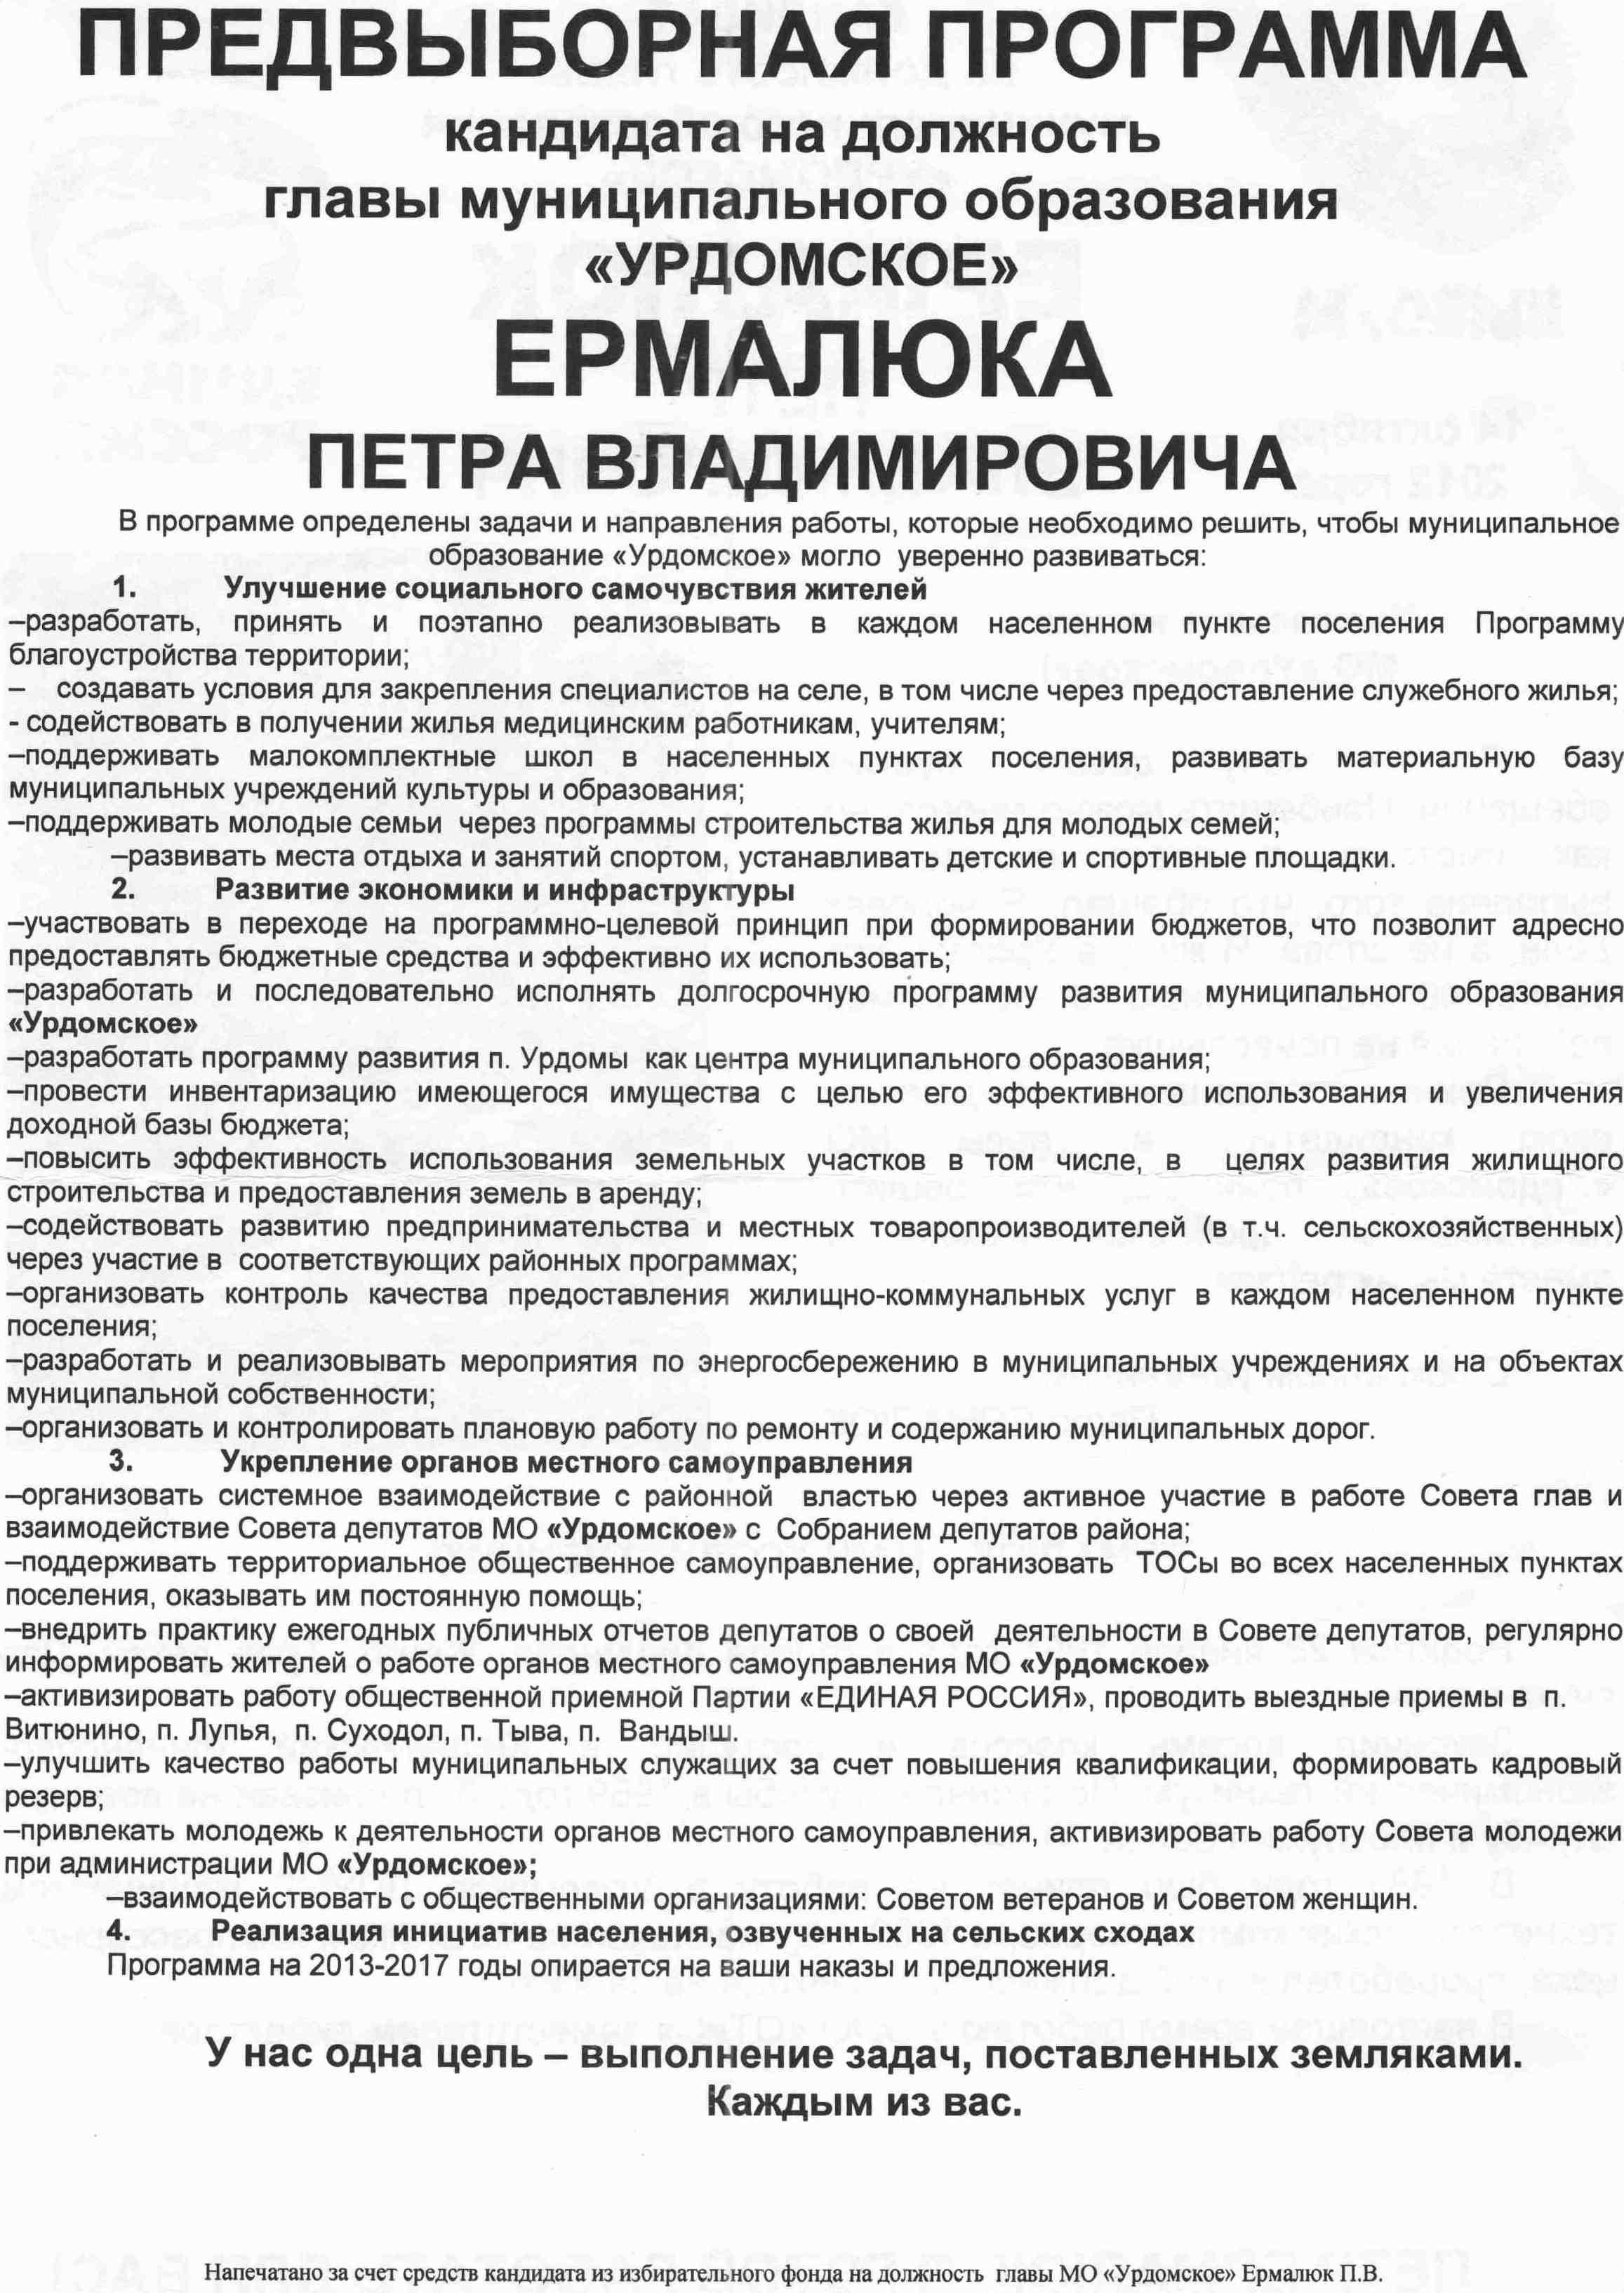 Ермалюк ПВ, кандидат (1)